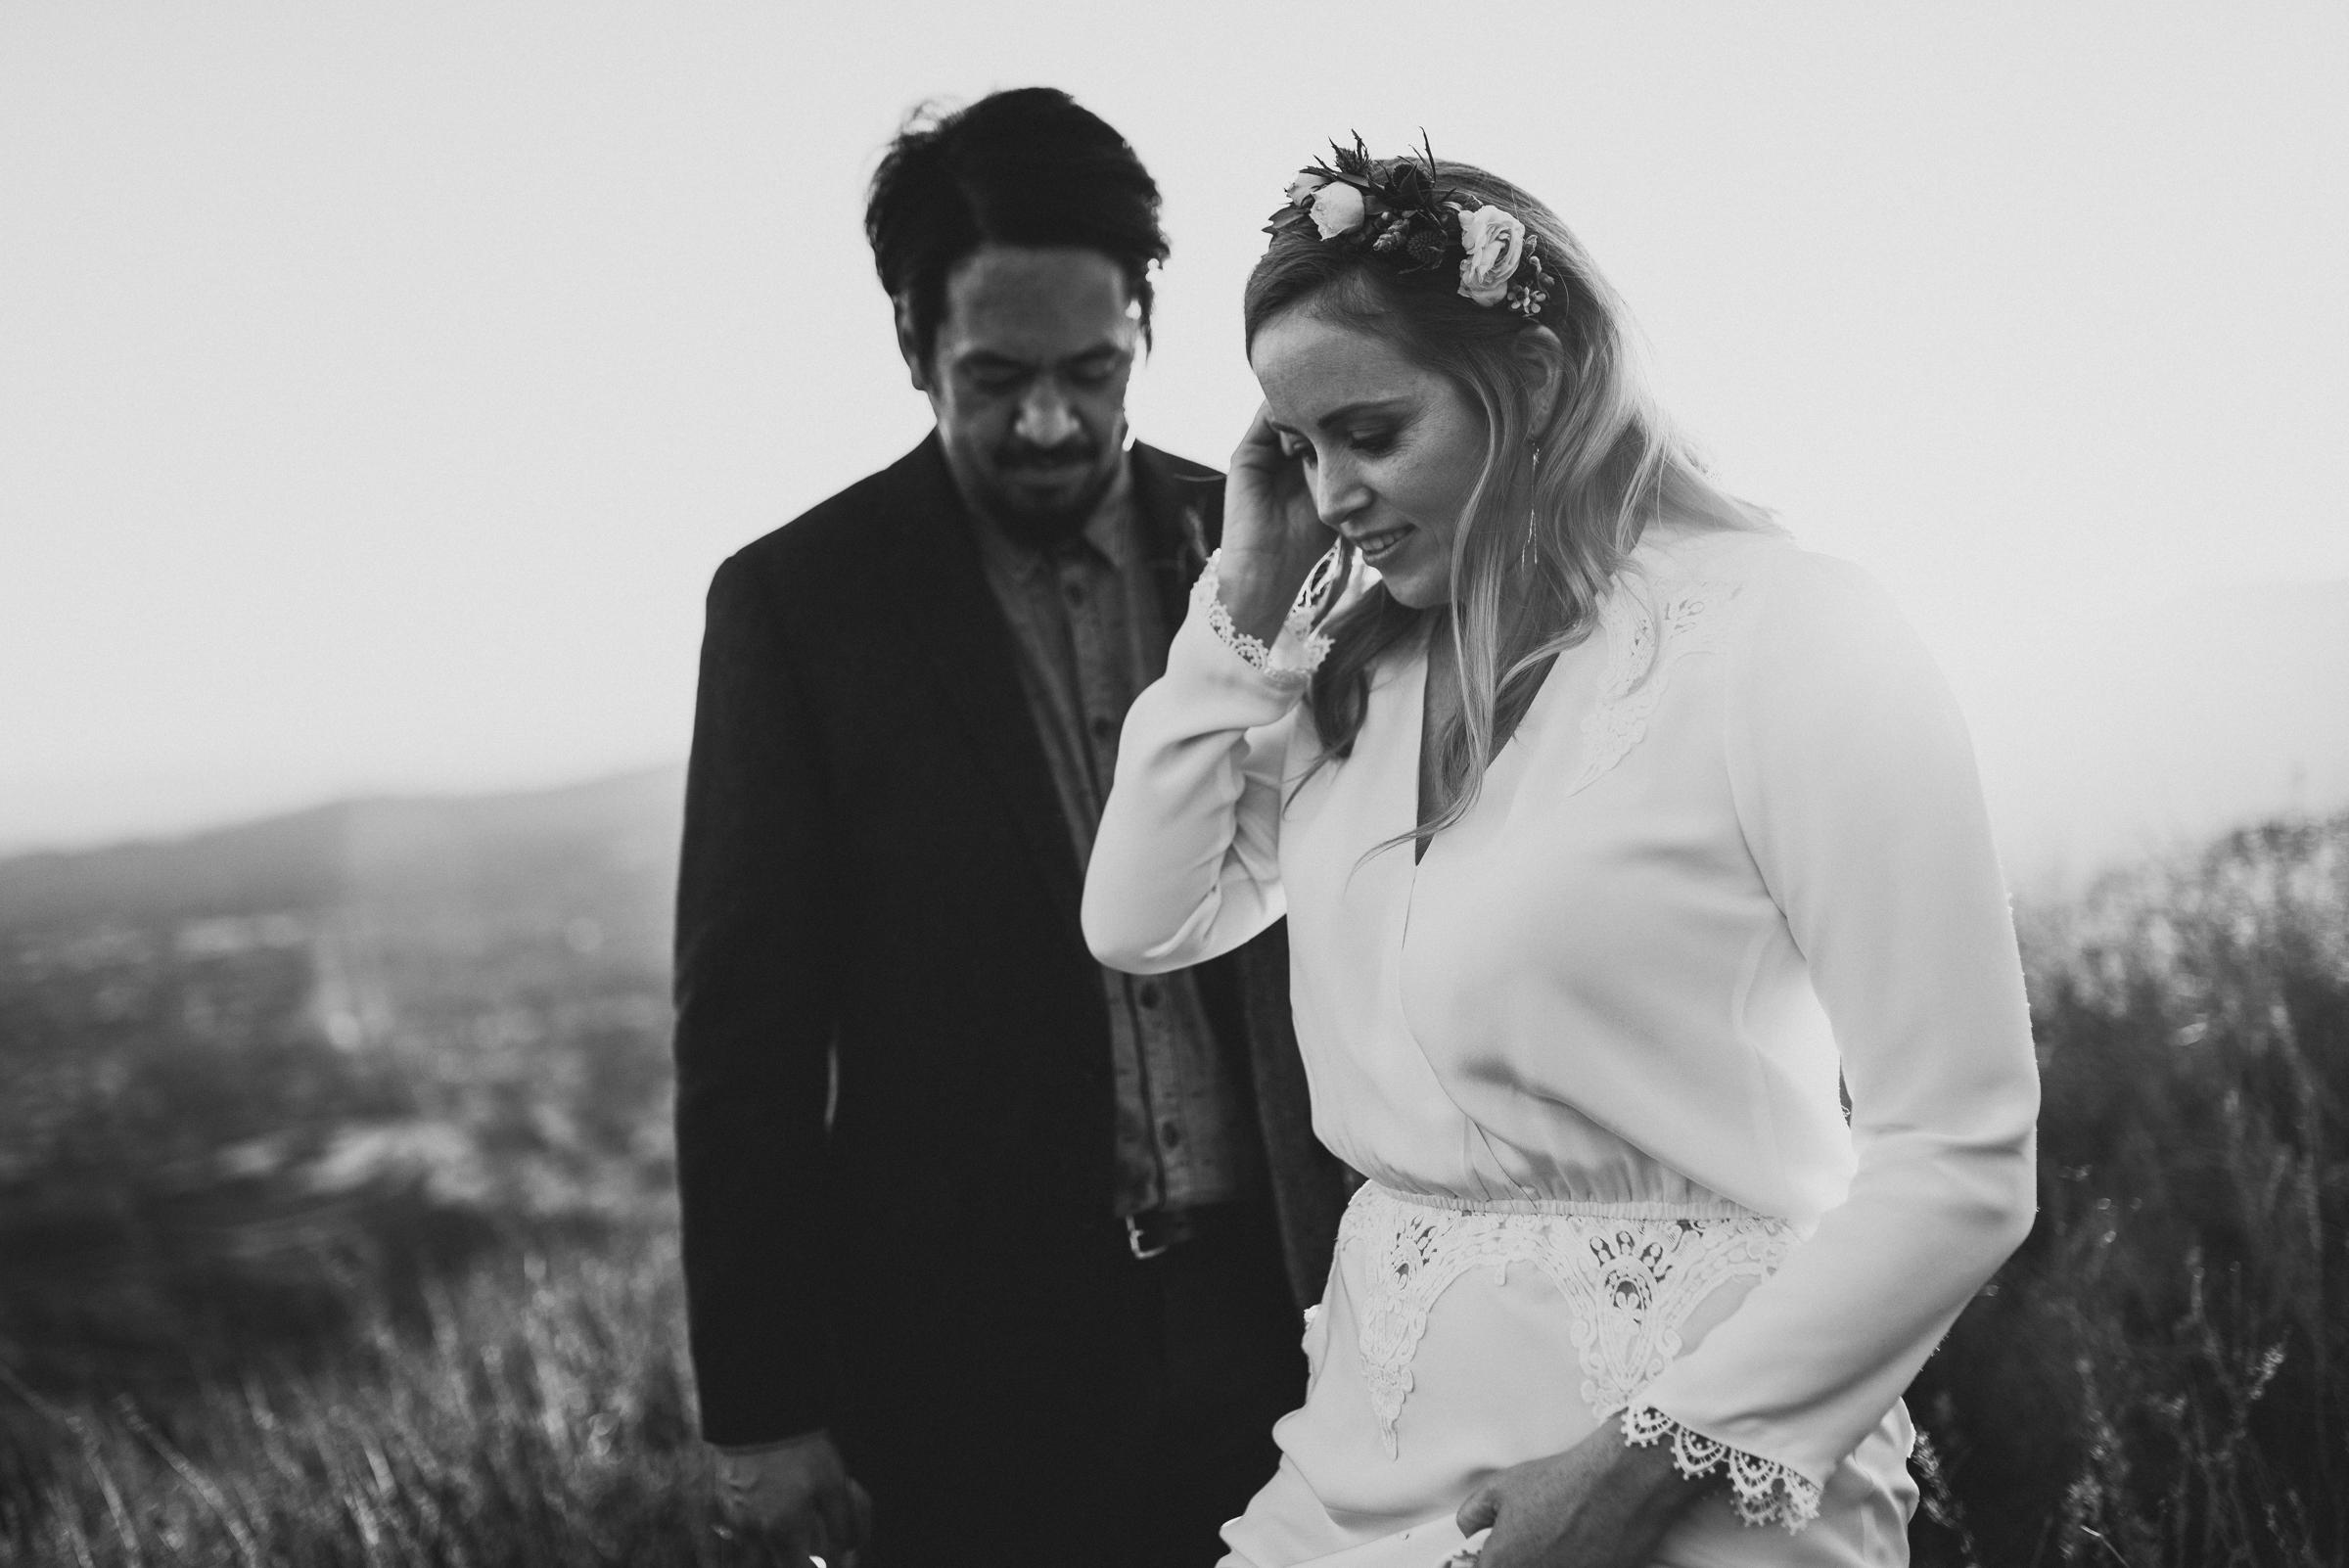 ©Isaiah + Taylor Photography - Intimate Elopement, Eaton Canyon, Los Angeles Wedding Photographer-88.jpg